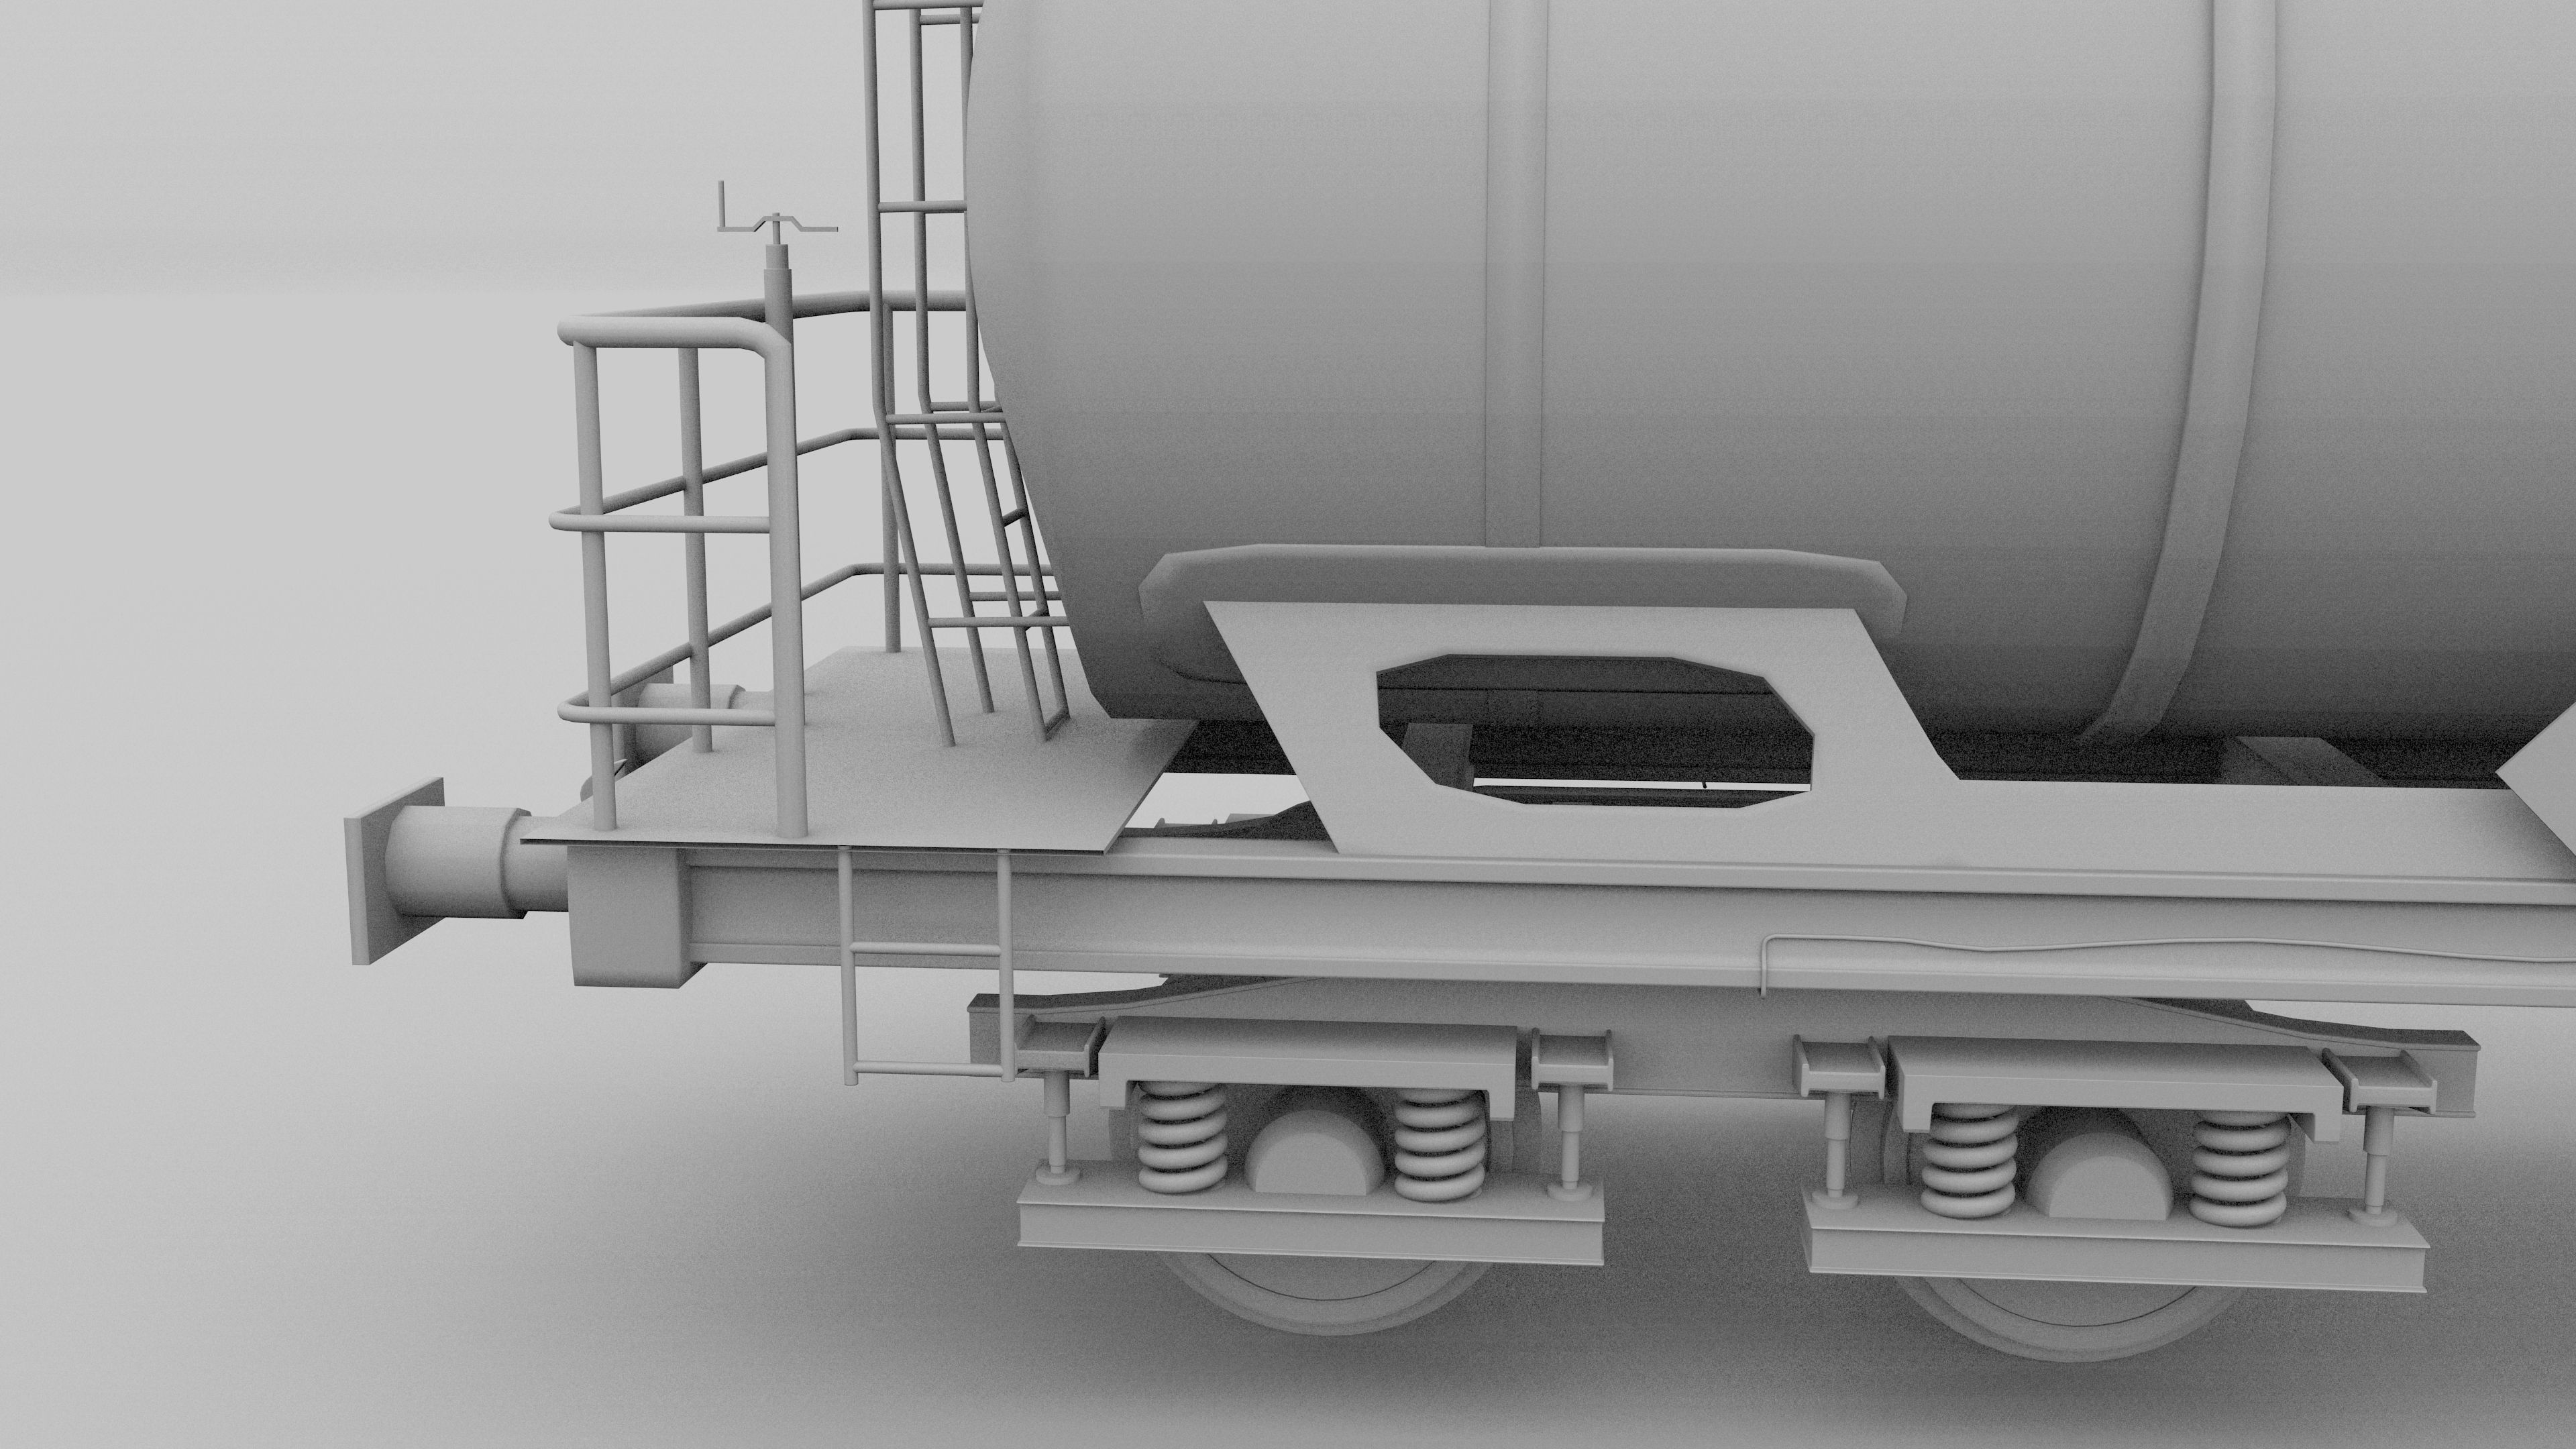 Train Tanker Car 3d Cgtrader